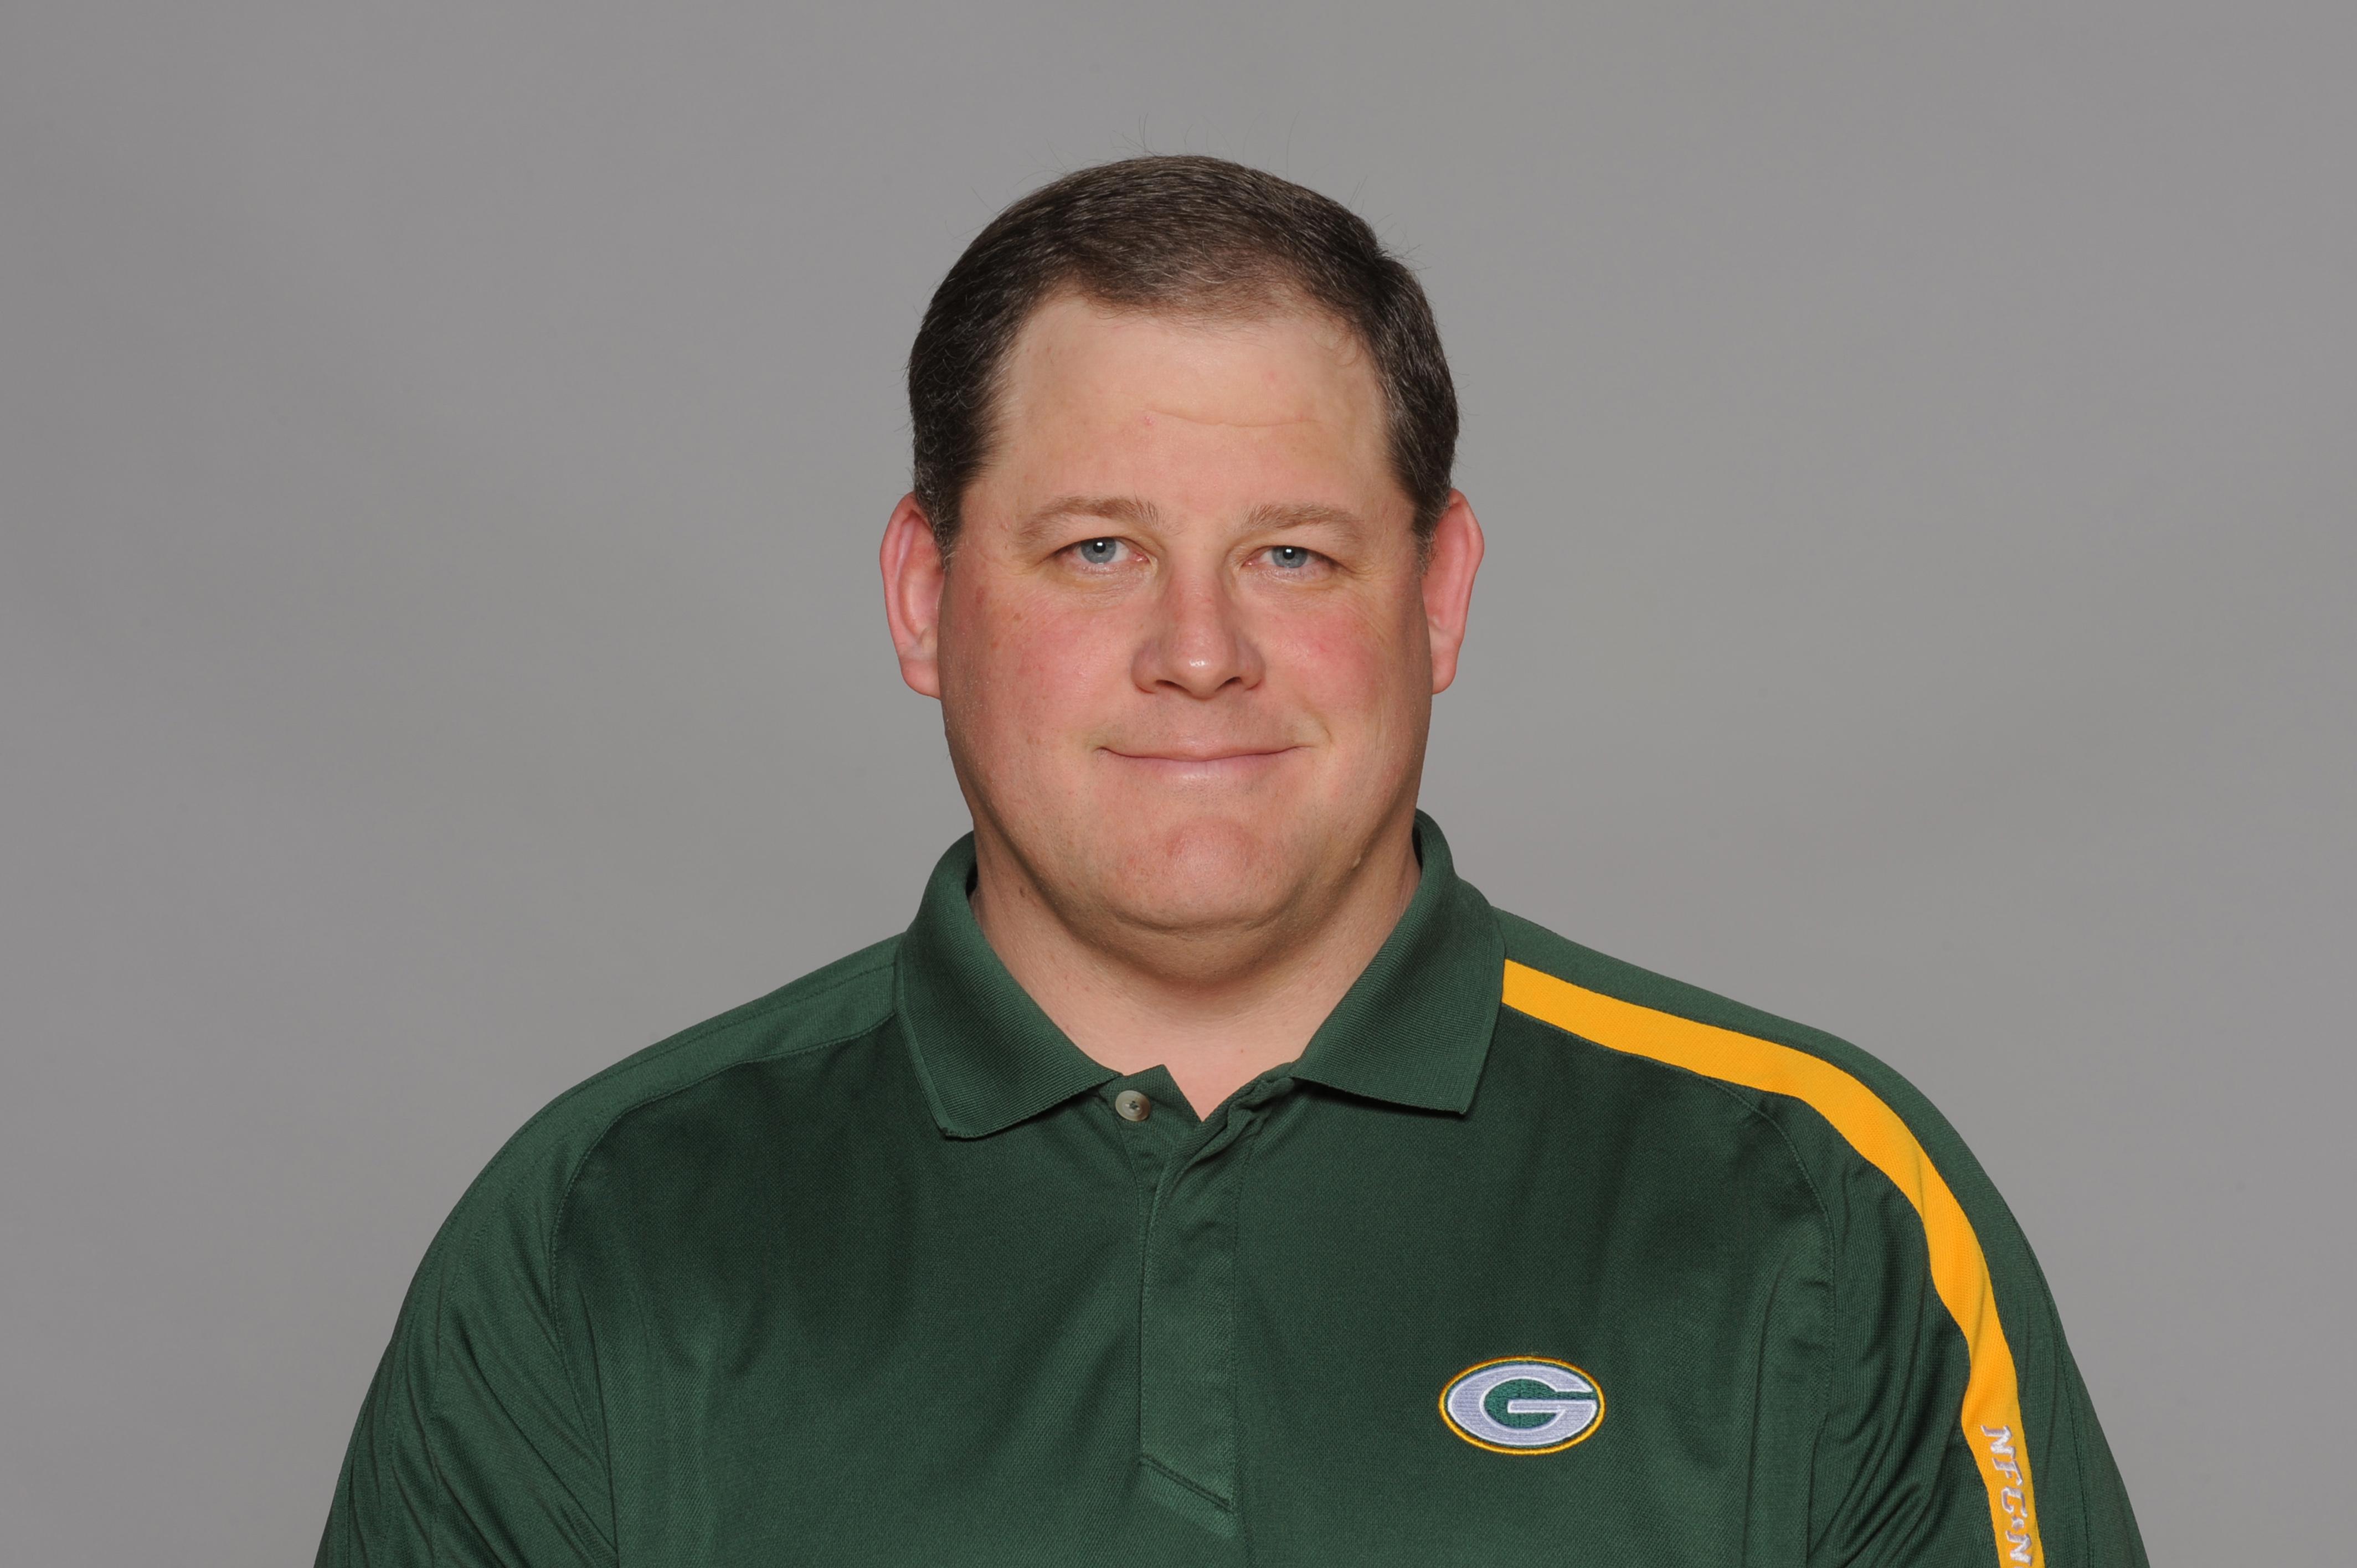 Green Bay Packers 2011 Headshots